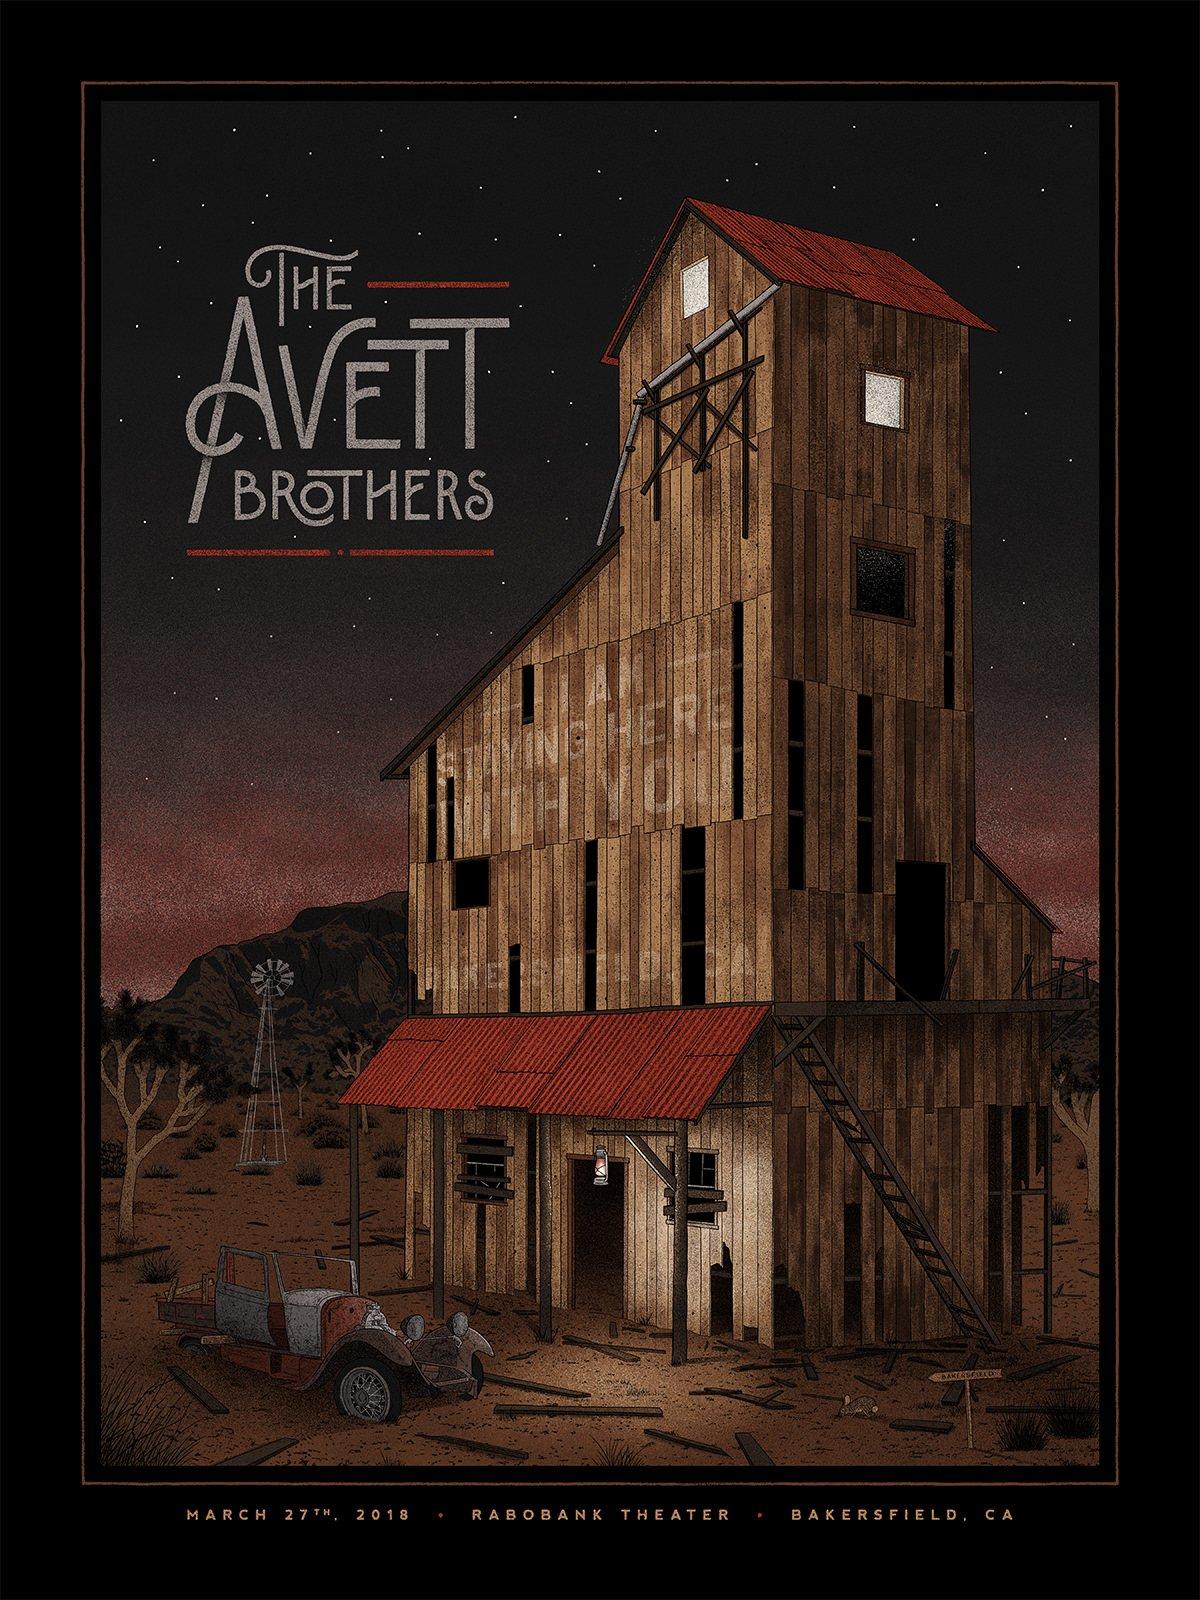 Nicholas-Moegly-The-Avett-Brothers-Gig-Poster-Bakersfield_1024x1024@2x.jpg